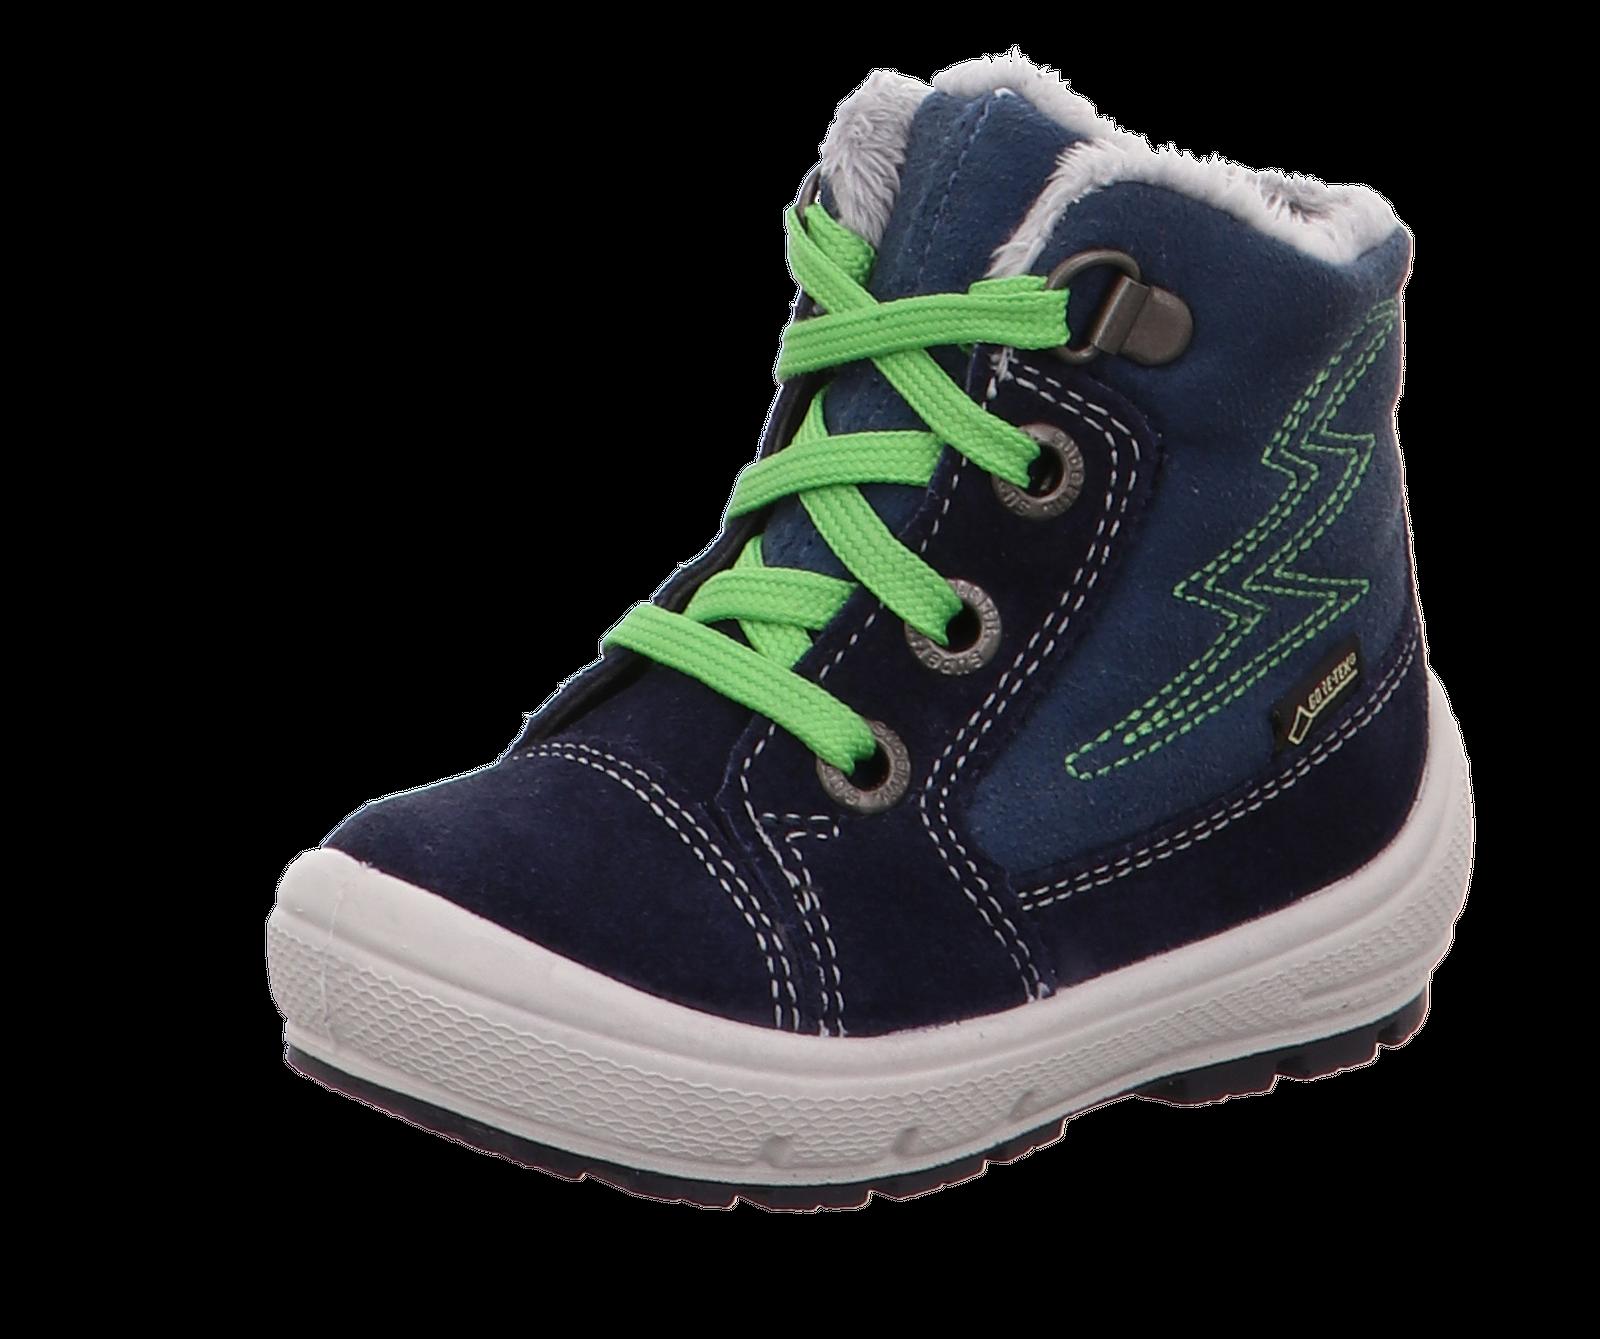 pretty nice 3c72e 0a305 superfit Kinder Gore-Tex Stiefel 3-09306-80 blau/grün